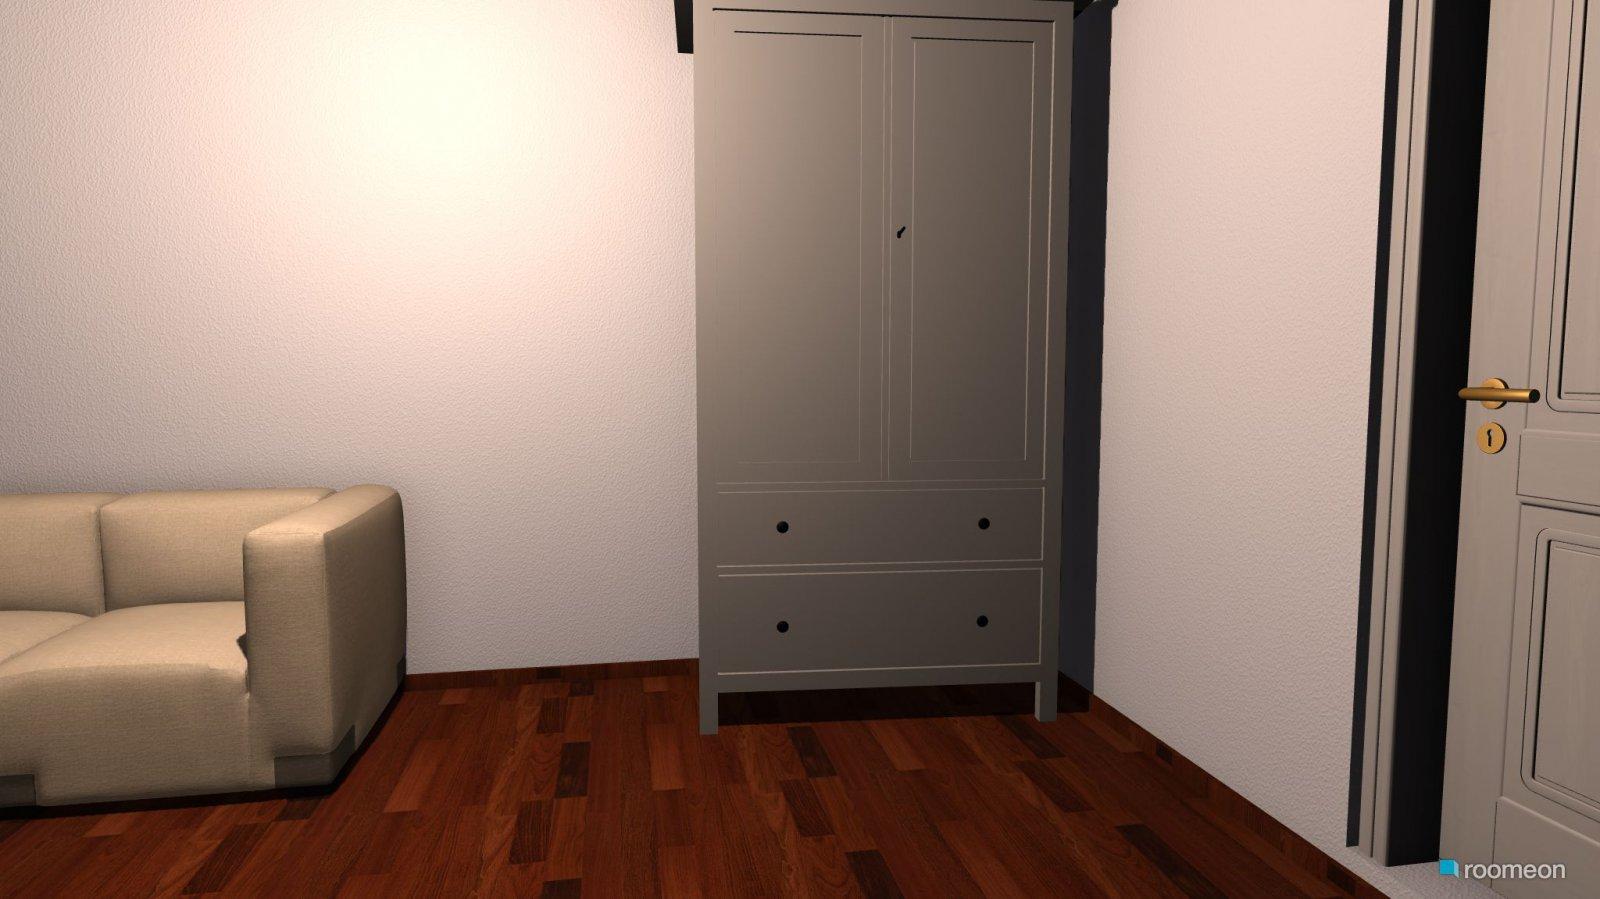 Room Design 2014 03 24 Alexx1 Roomeon Community